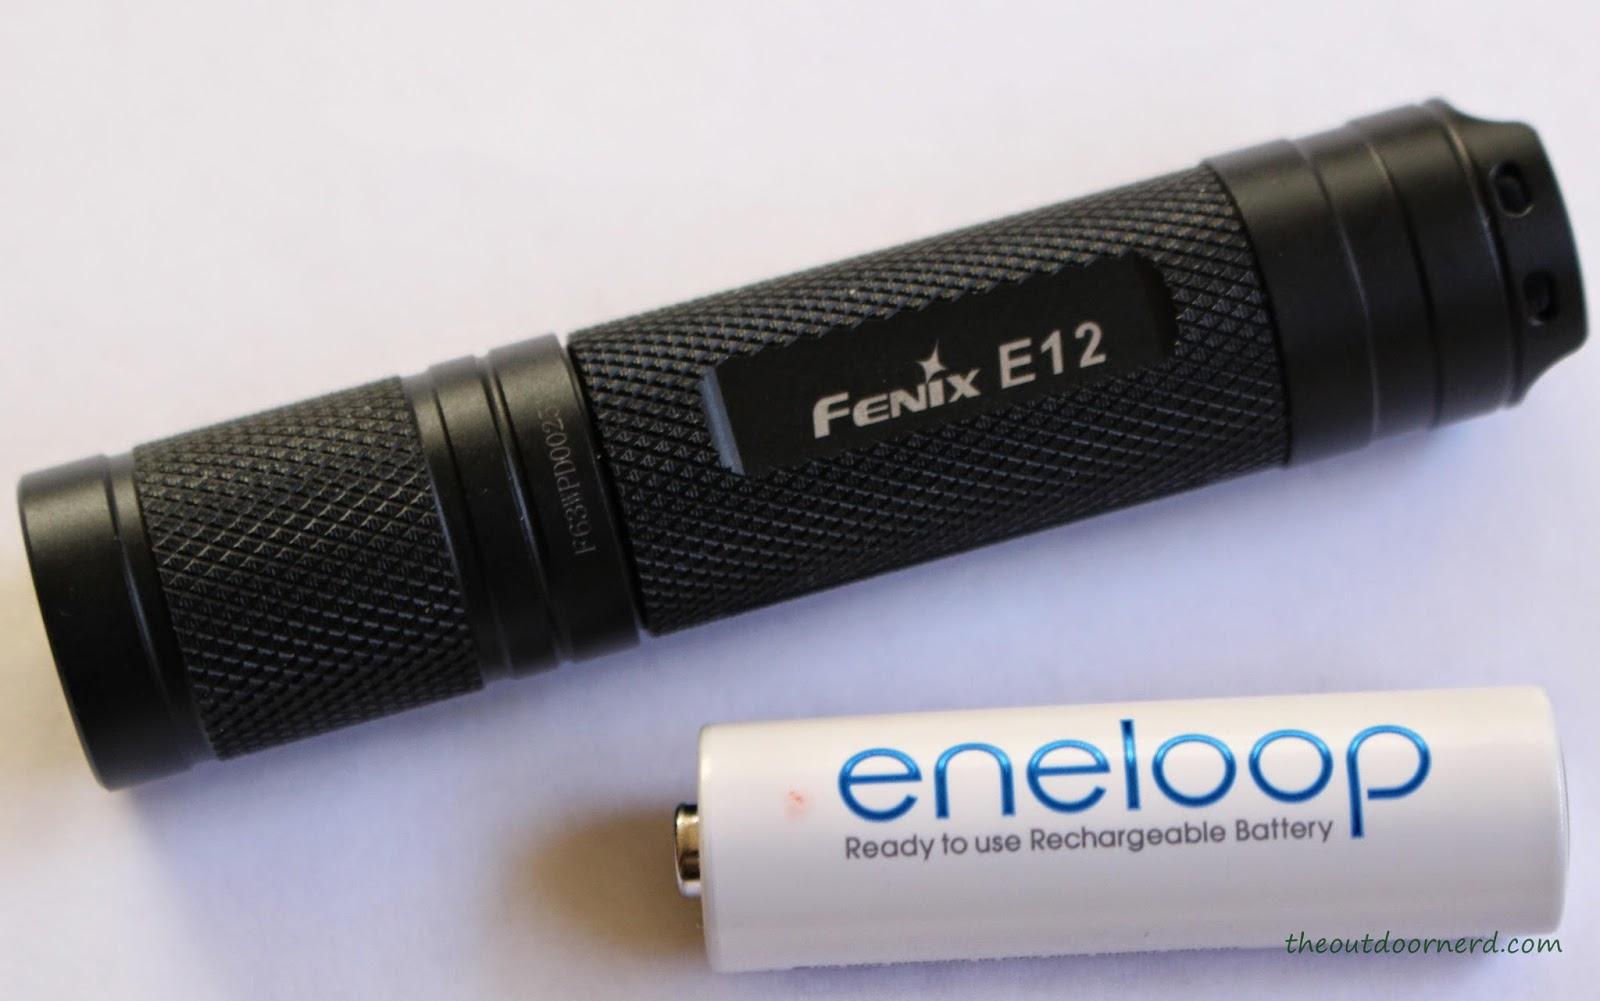 Fenix E12 1xAA EDC Flashlight Product Image 8